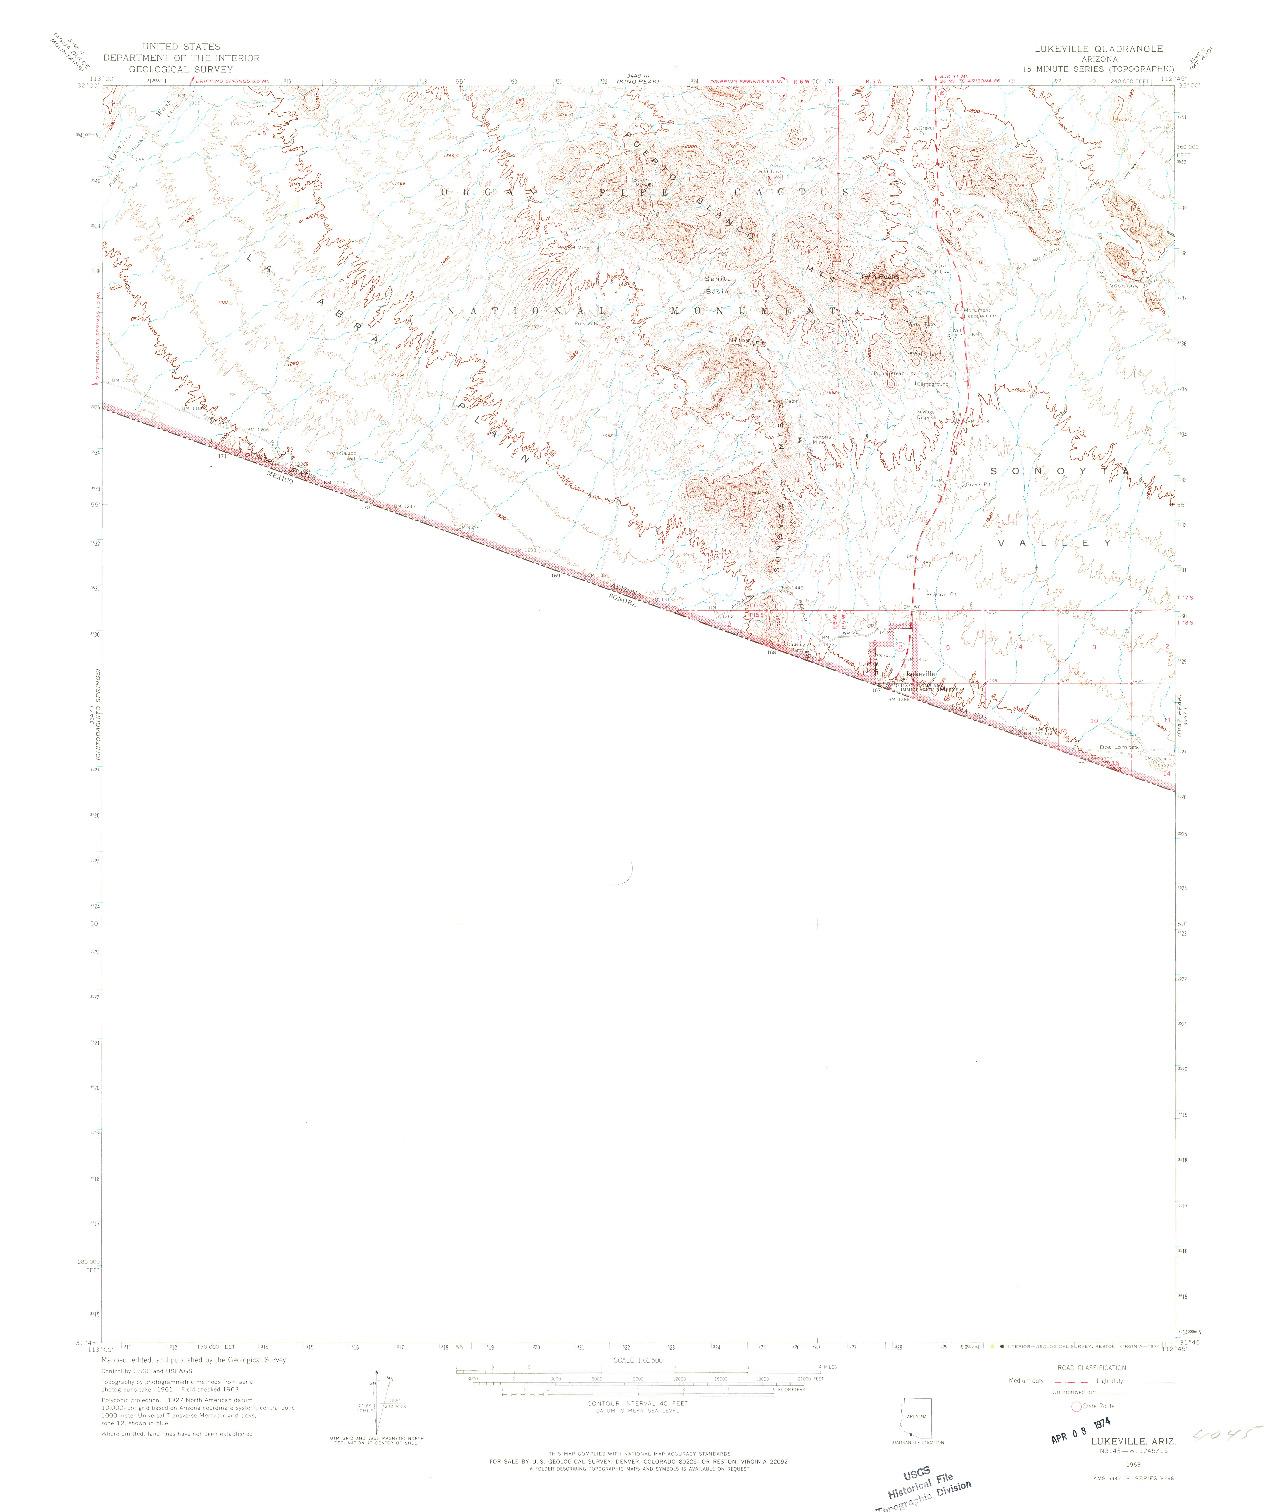 USGS 1:62500-SCALE QUADRANGLE FOR LUKEVILLE, AZ 1963